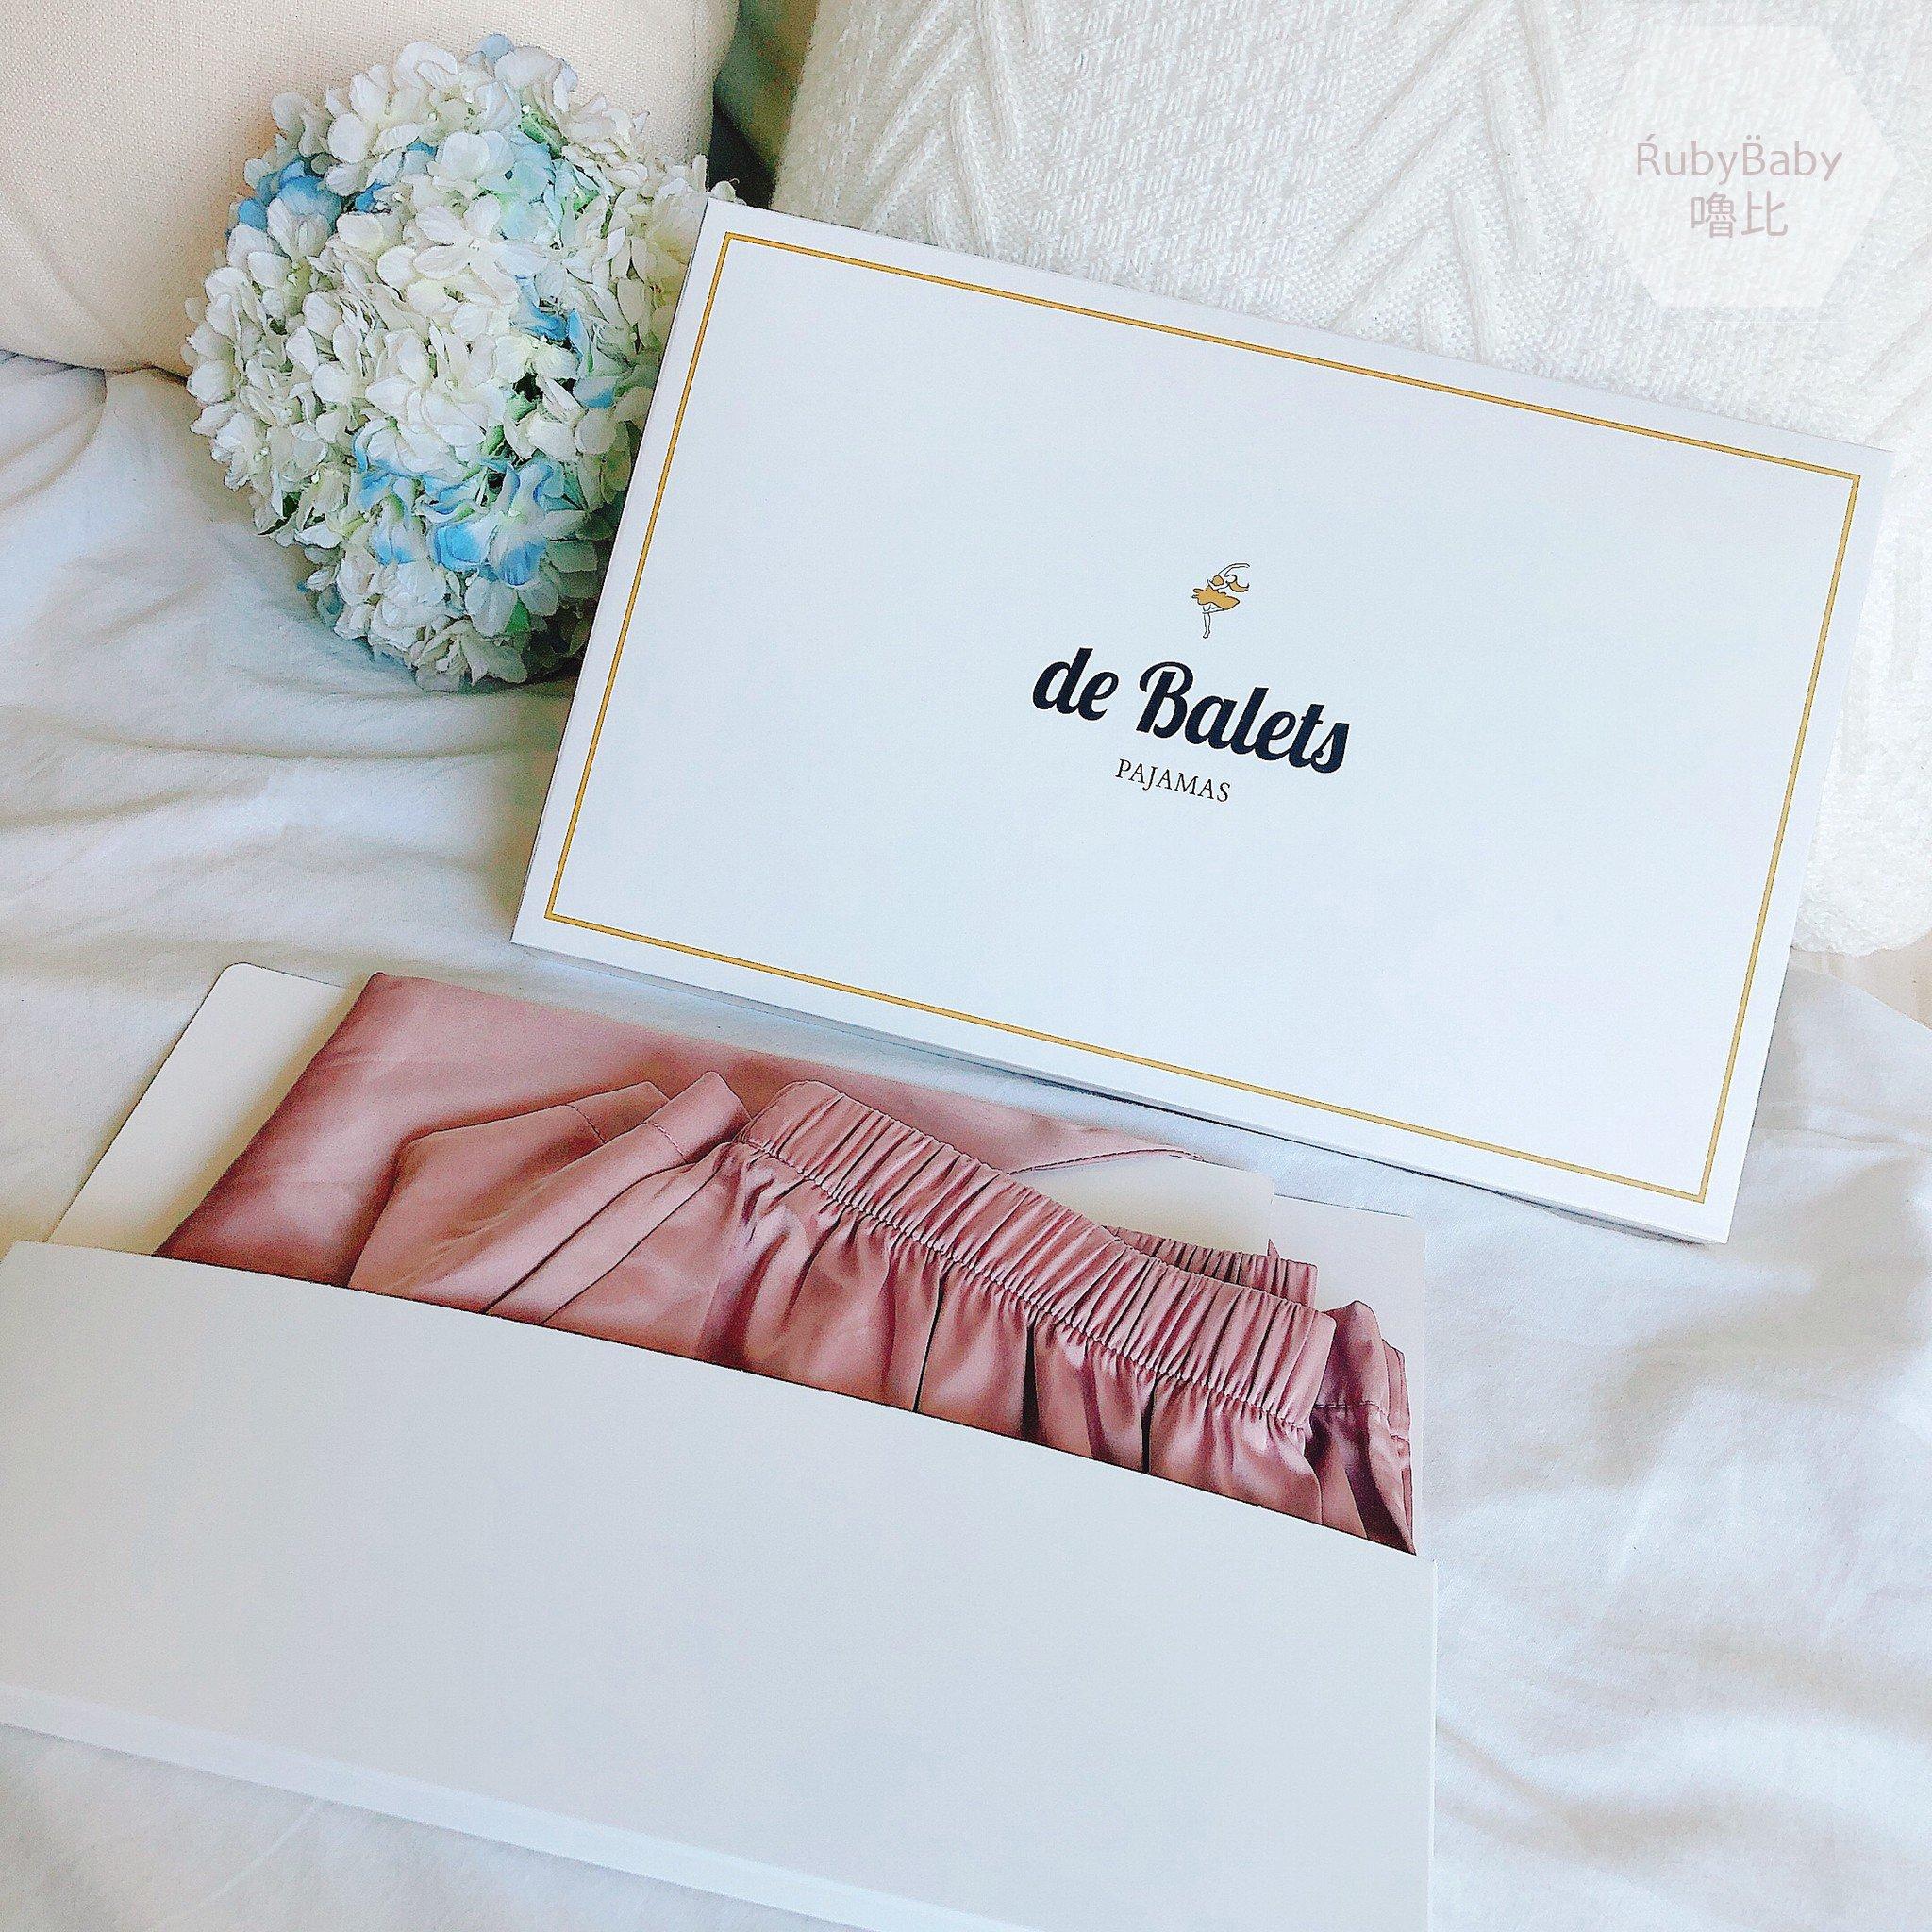 de Balets小巴黎開箱 親膚睡衣禮盒套組 蓮藕粉